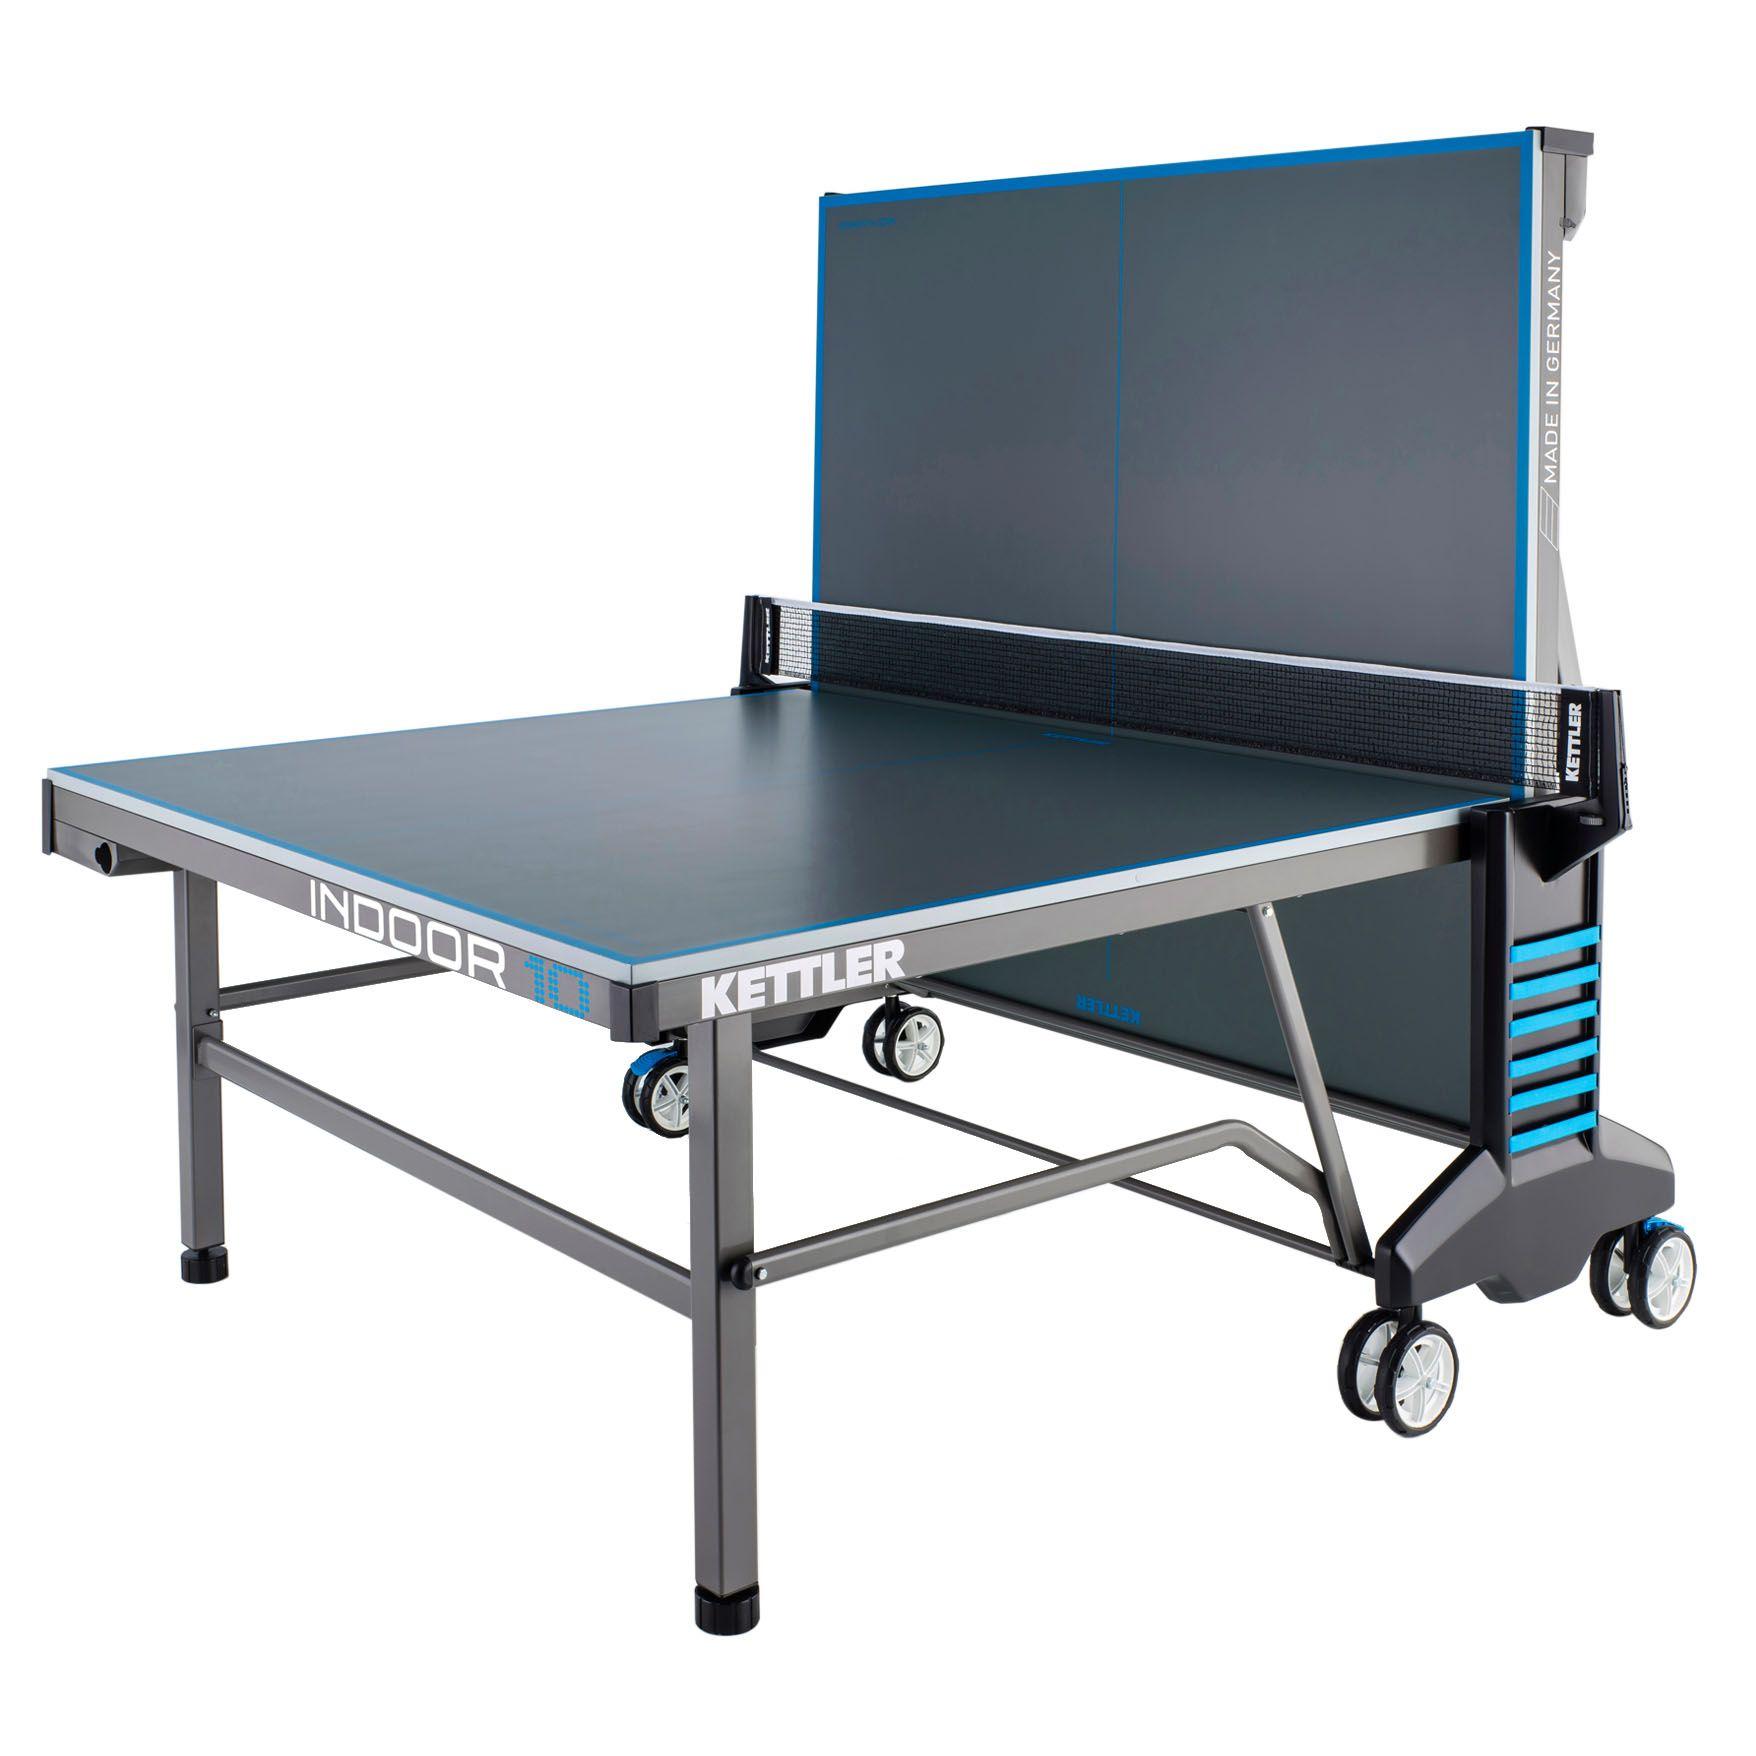 Kettler Classic Indoor 10 Table Tennis Table Sweatband Com